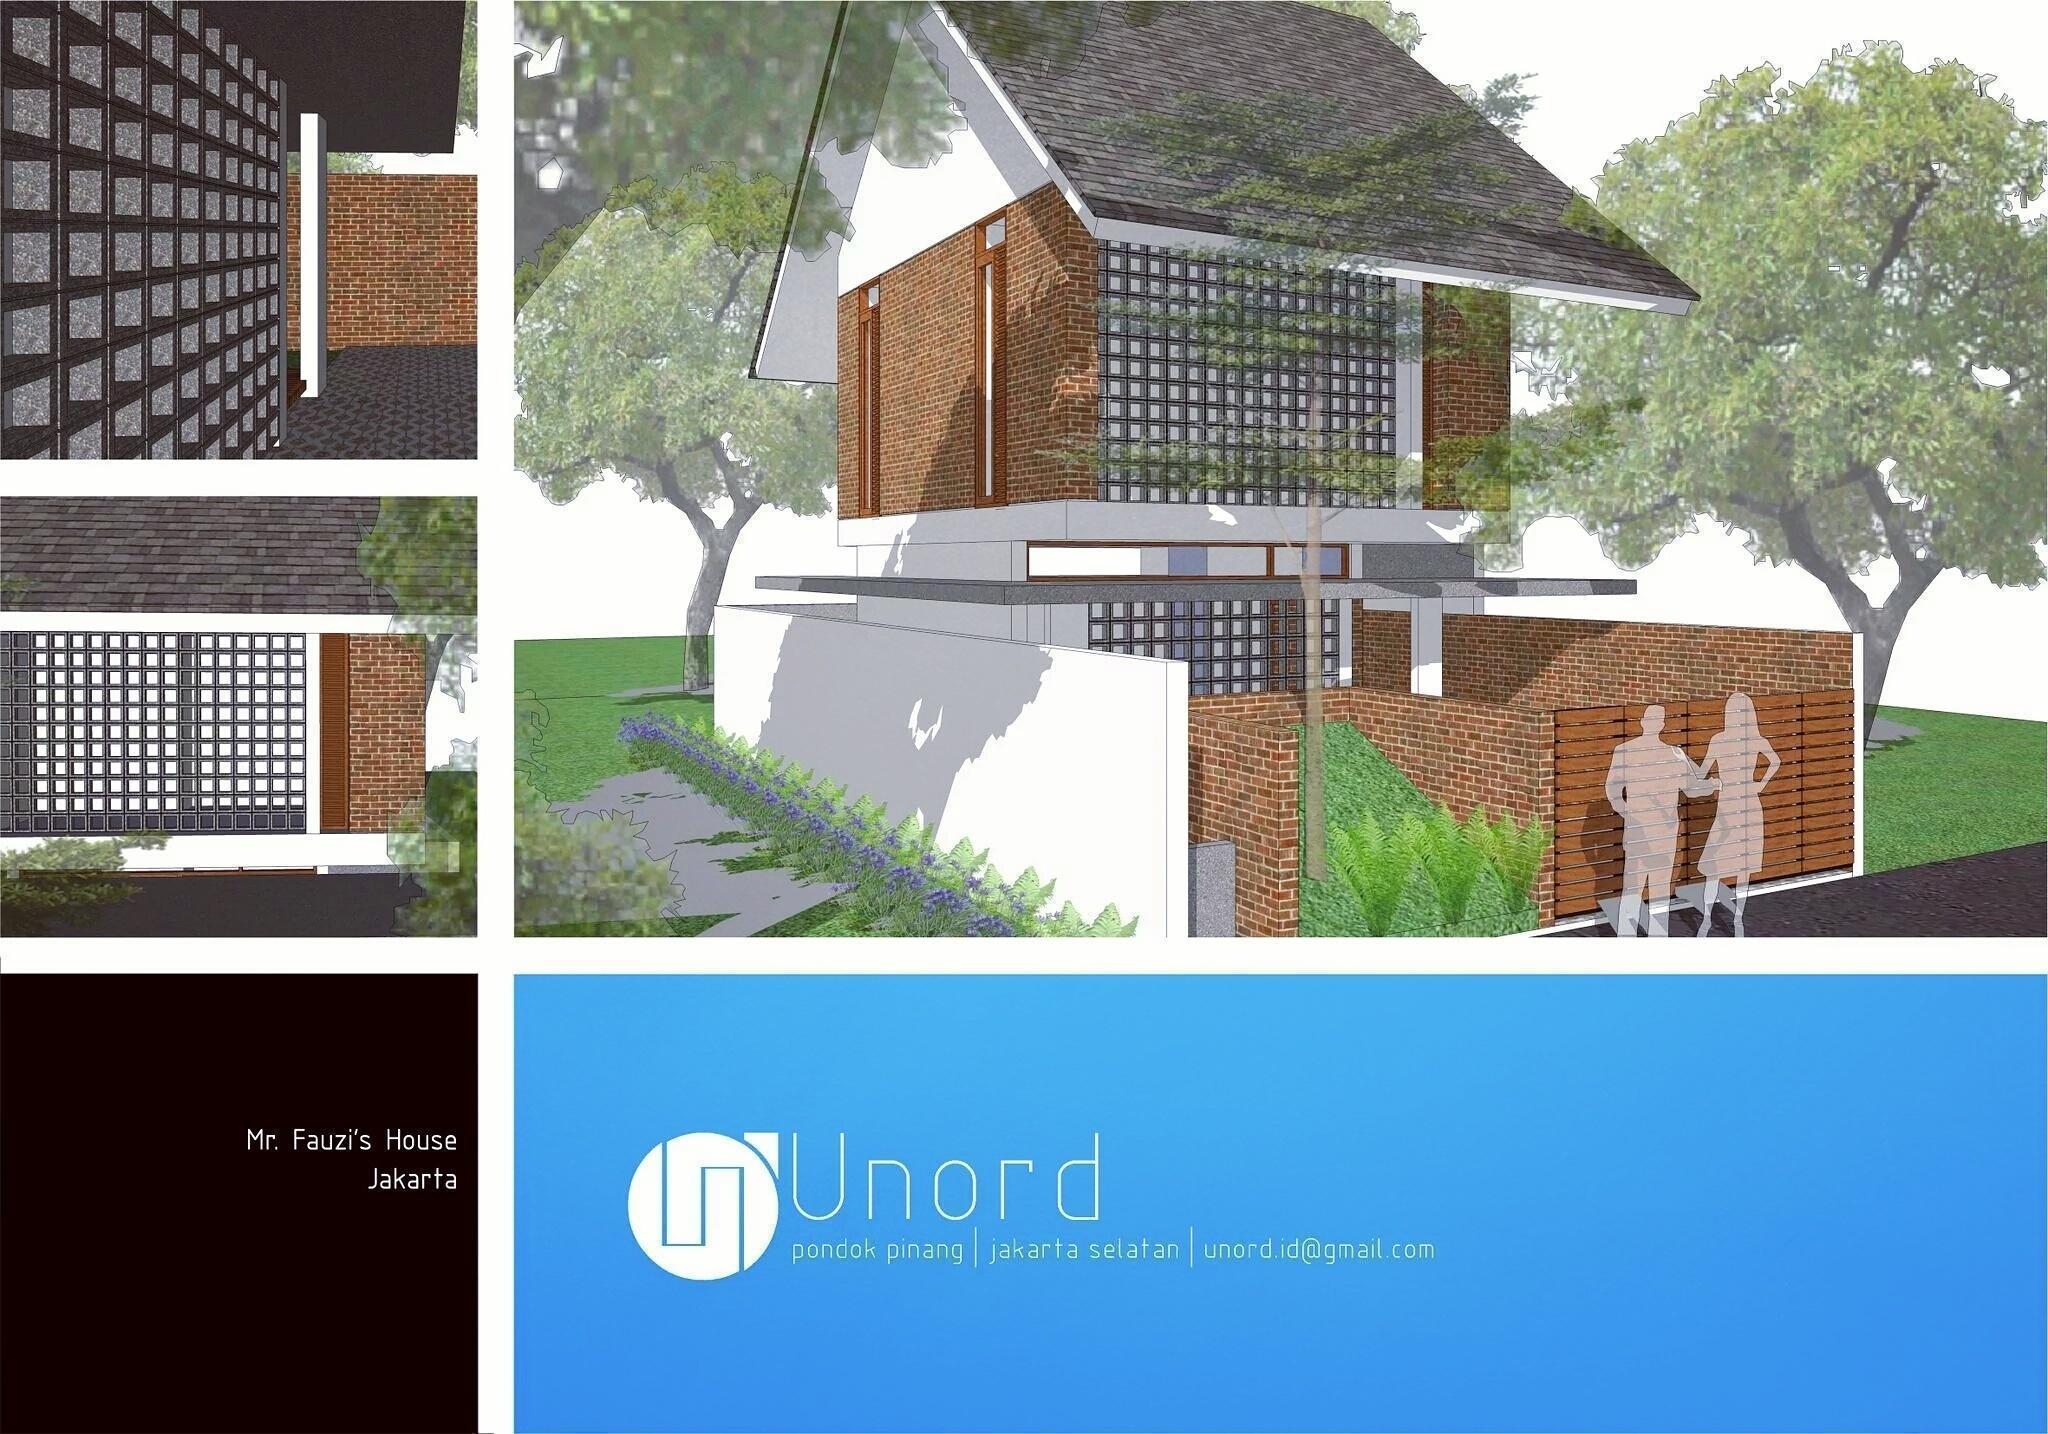 UNORD Architect